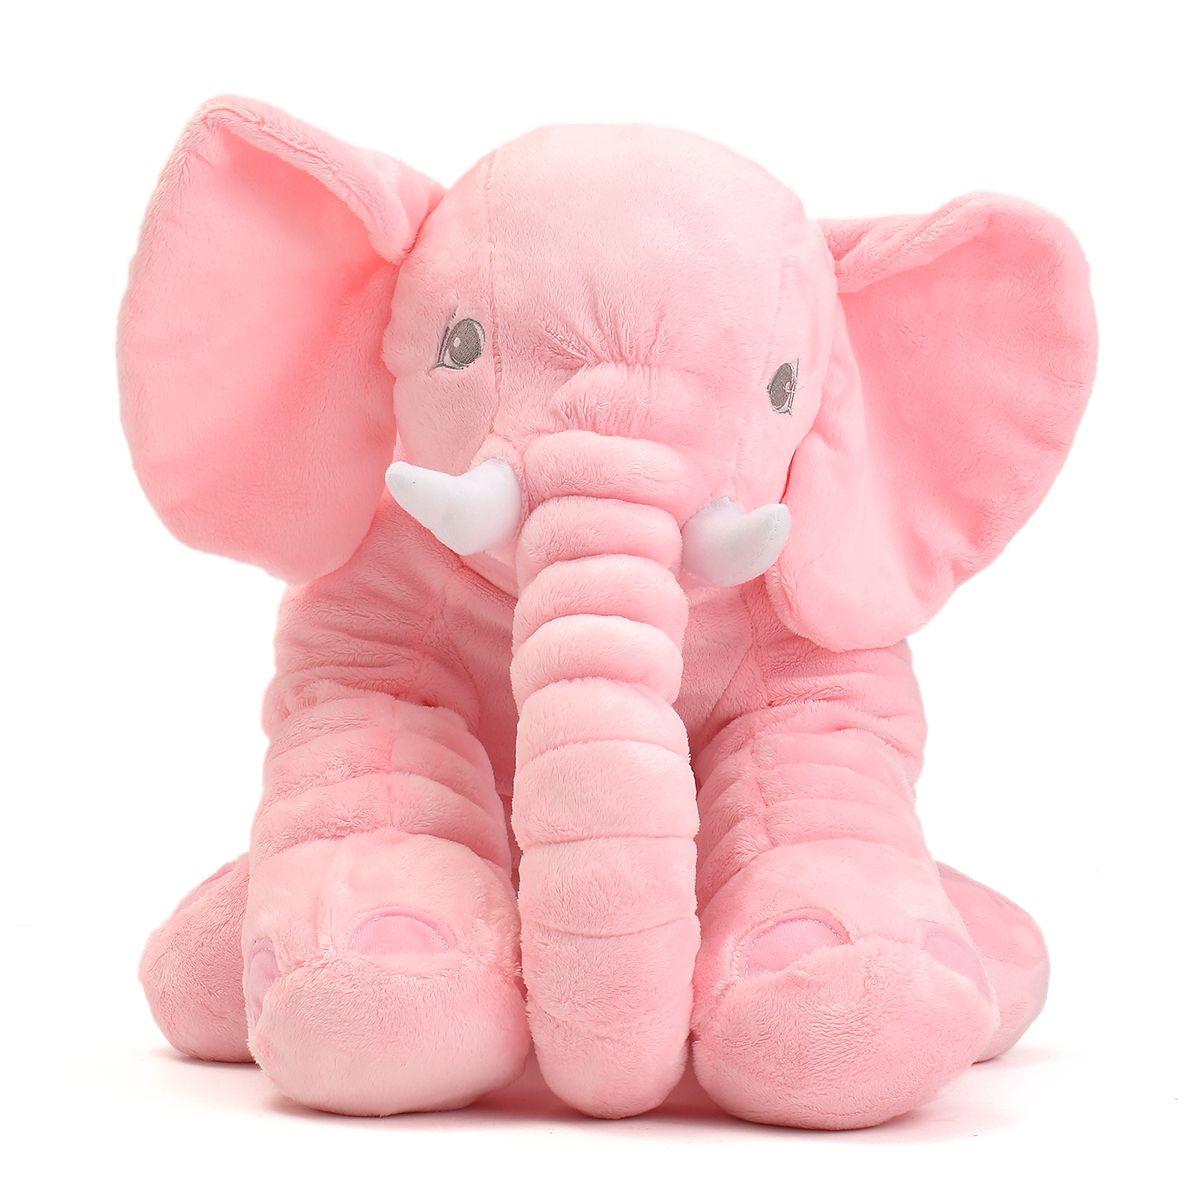 45x23x53 Cm Pink Large Elephant Pillows Cushion Baby Plush Toy  # Muebles Sirena Animal Crossing